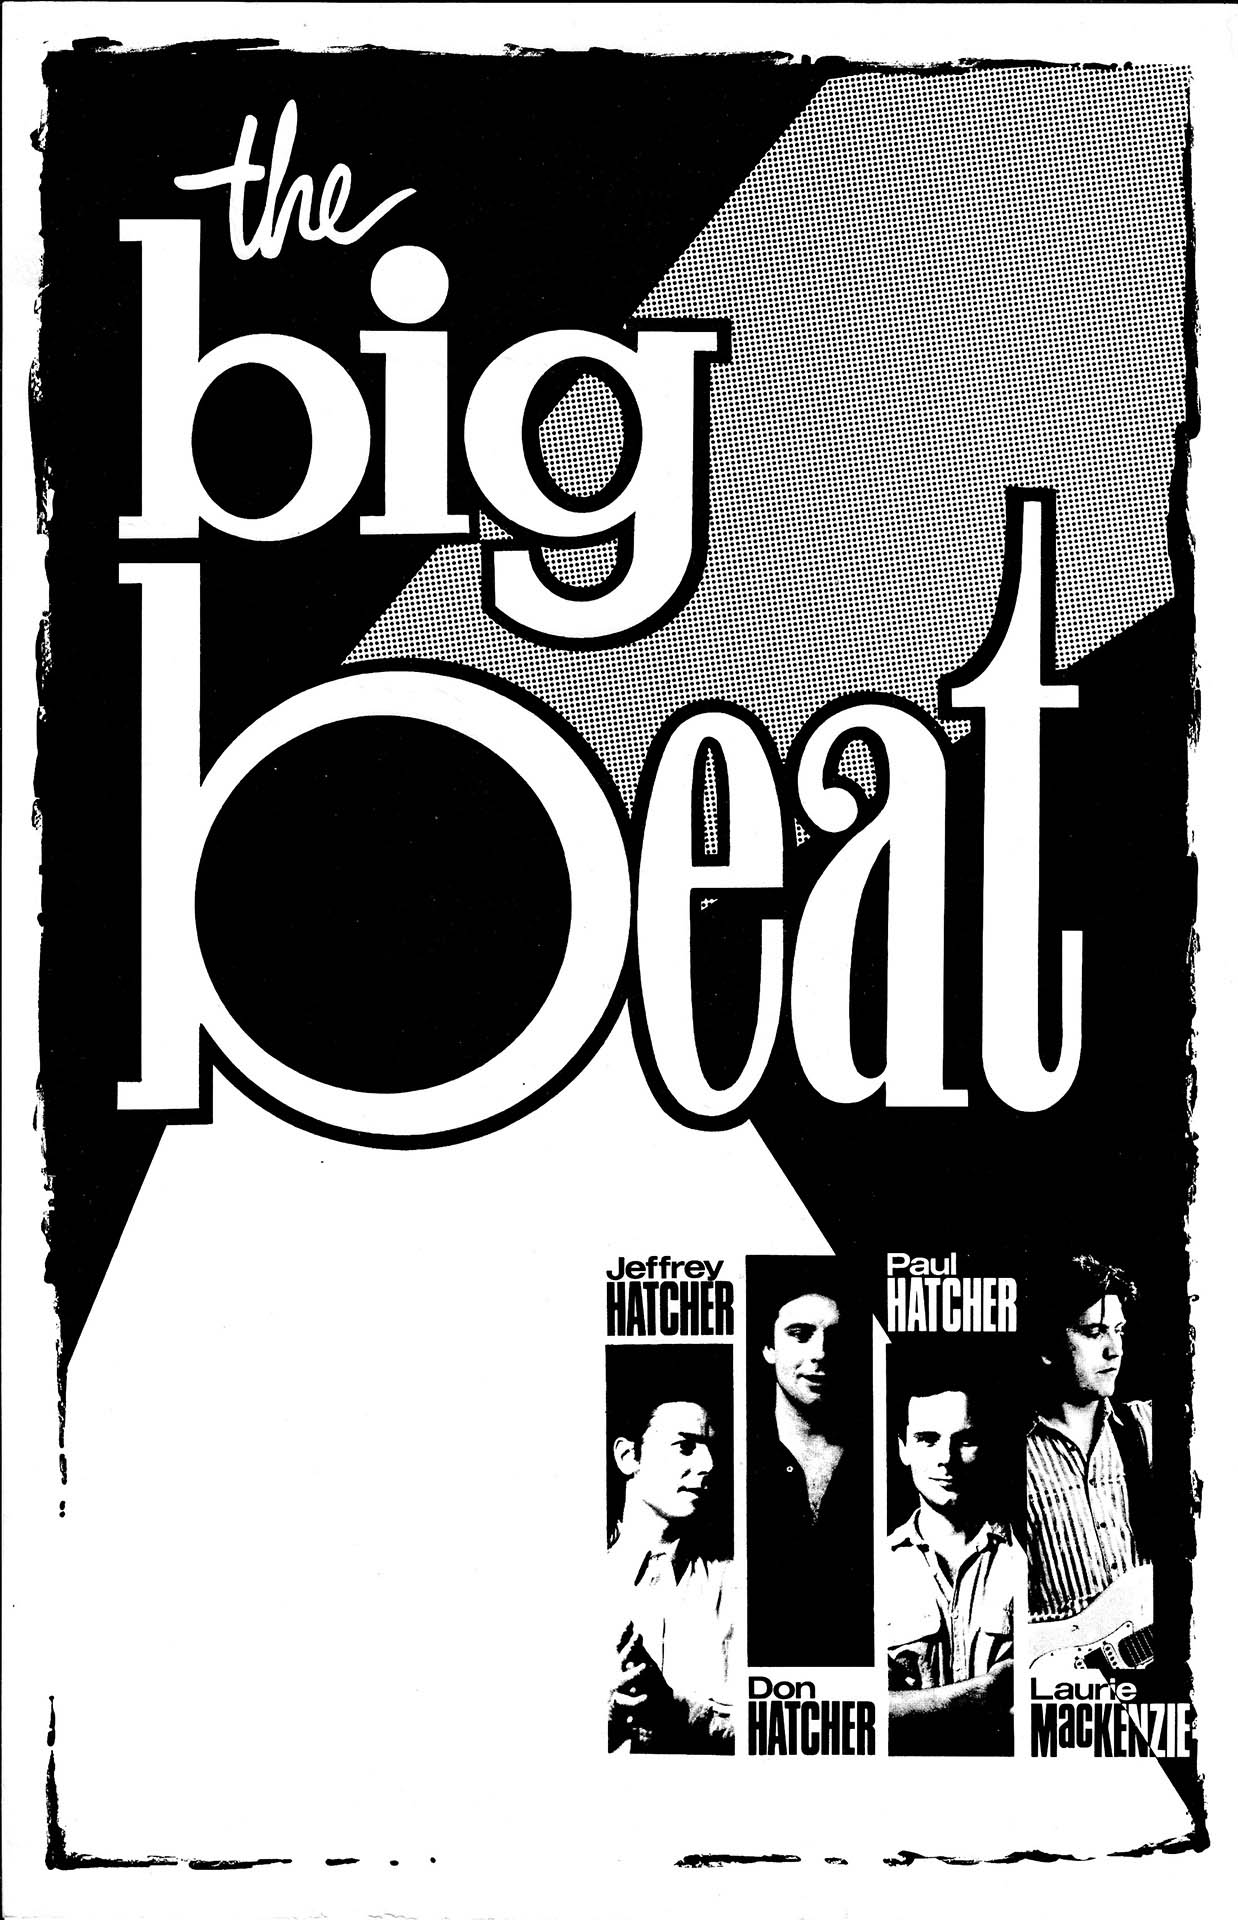 The Big Beat - 1989